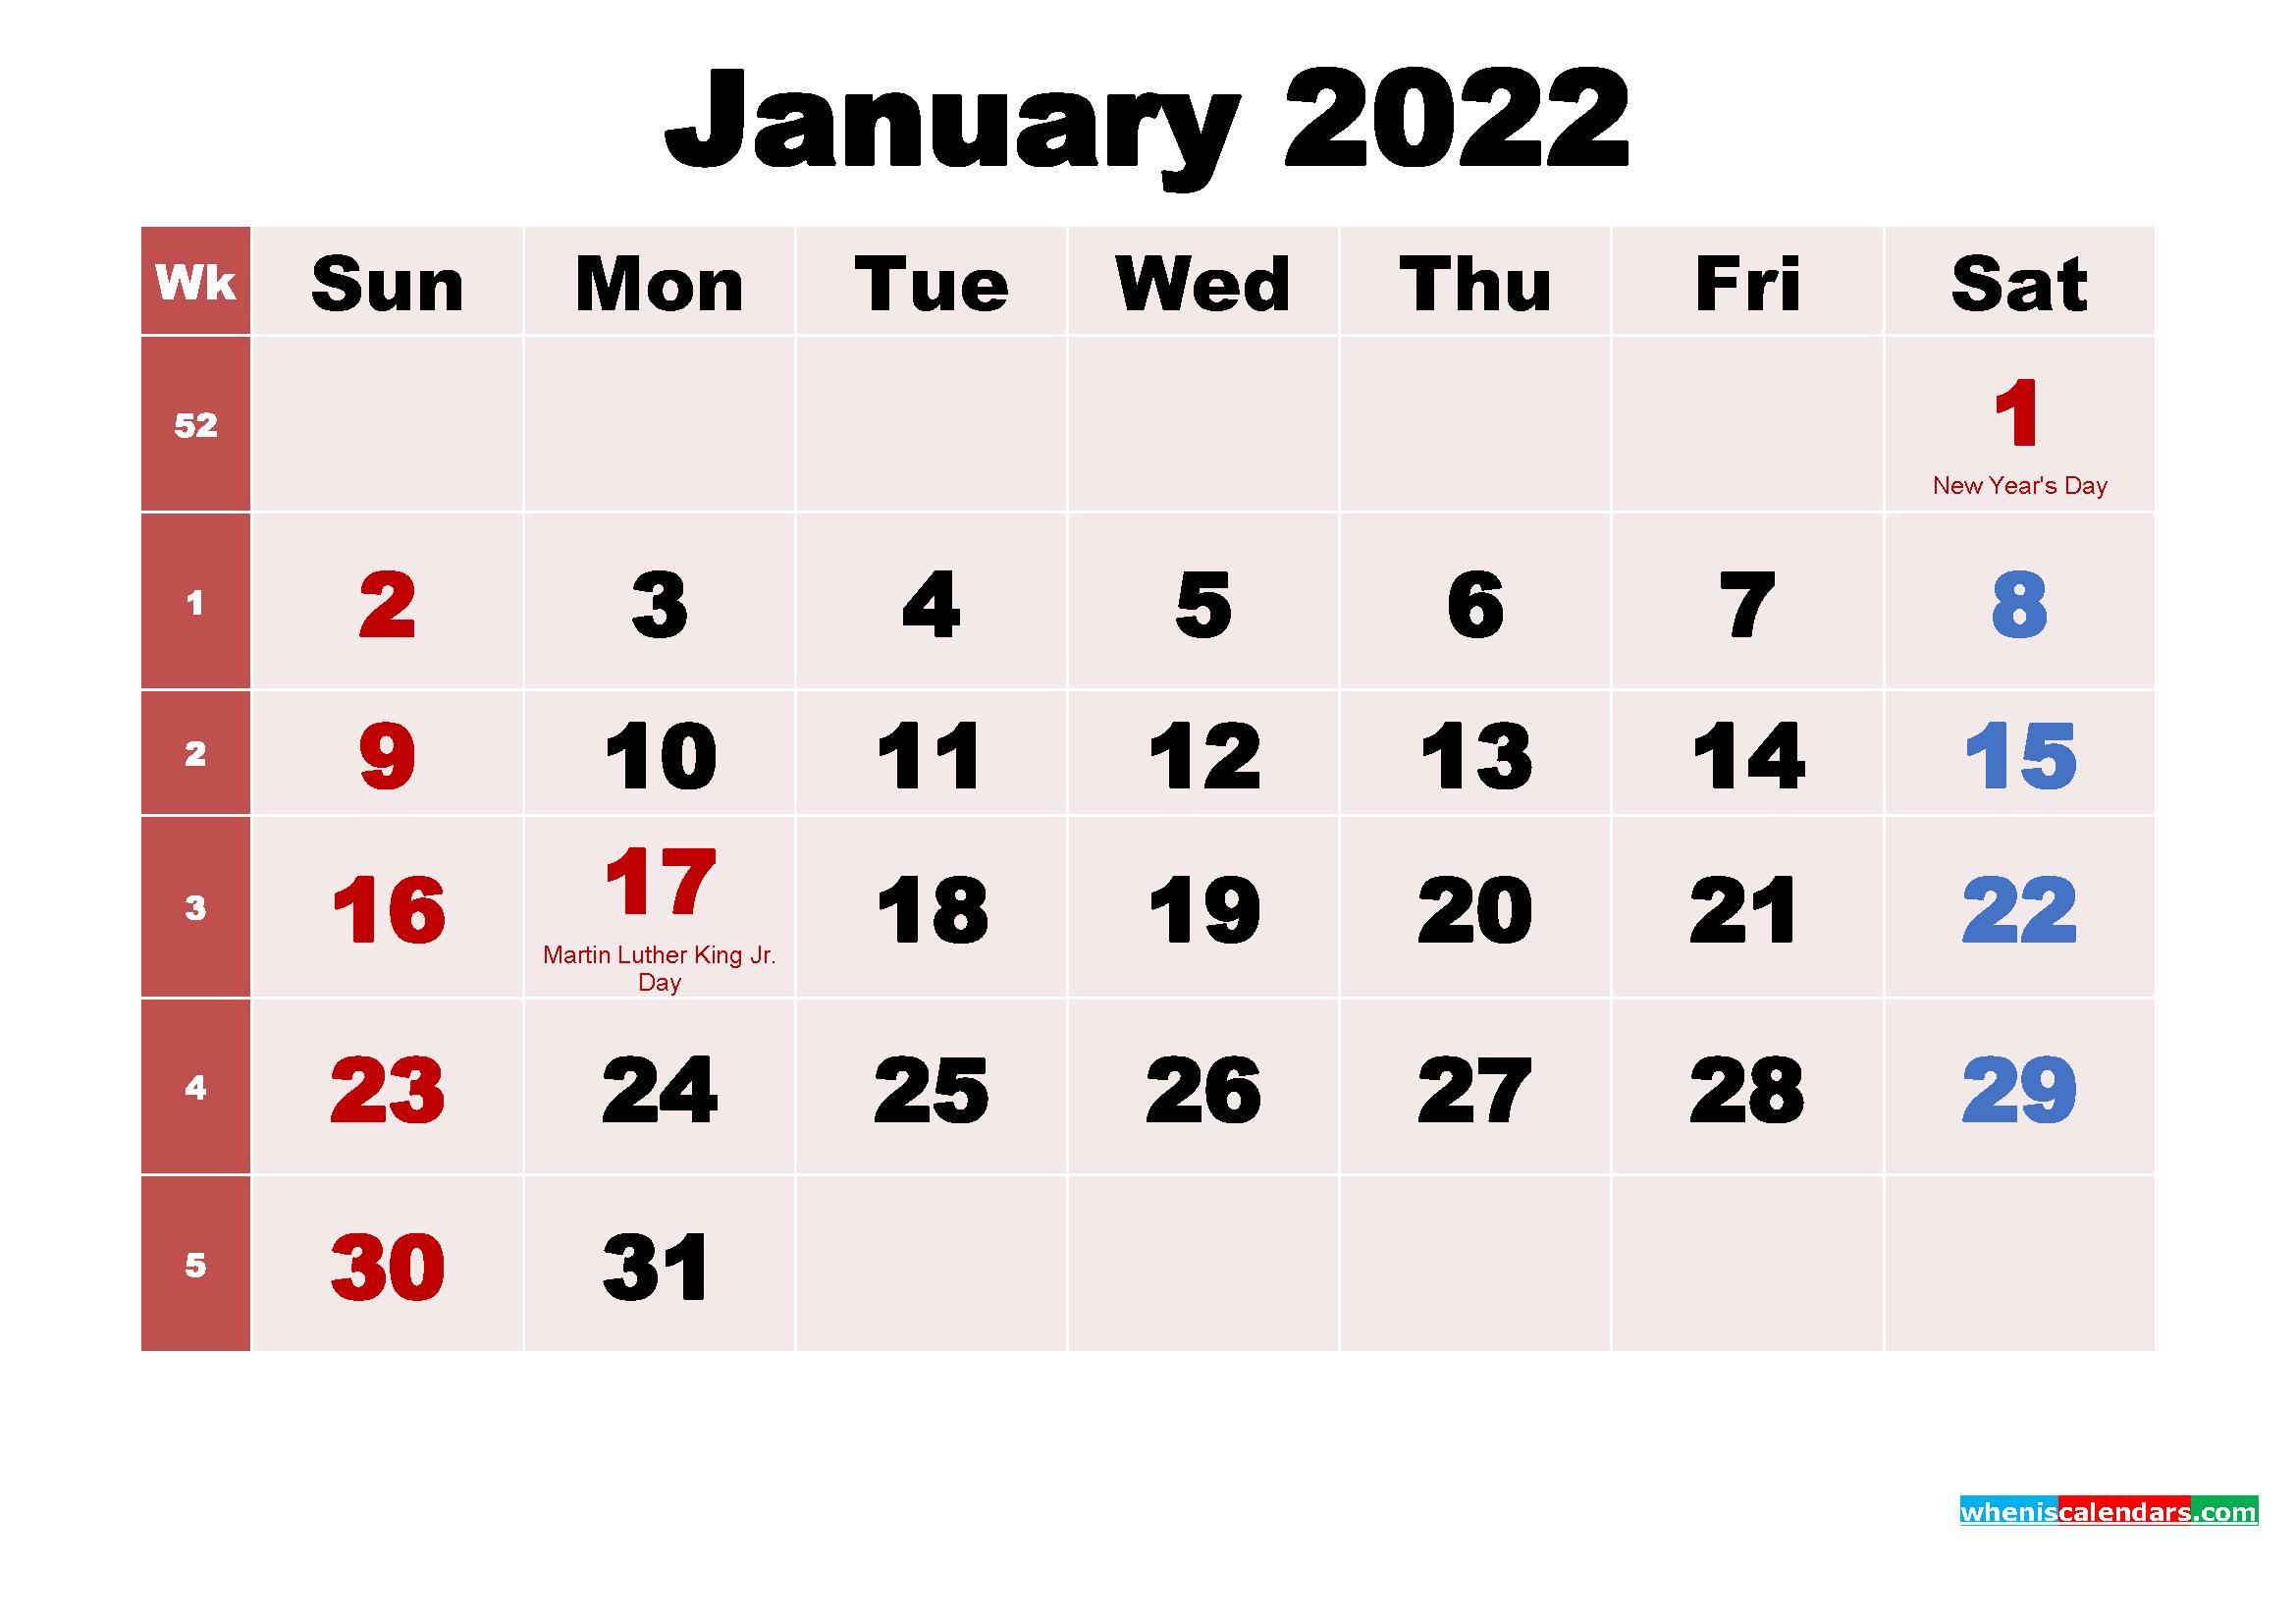 Free Printable January 2022 Calendar With Holidays As Word Throughout Calendar 2022 January Printable